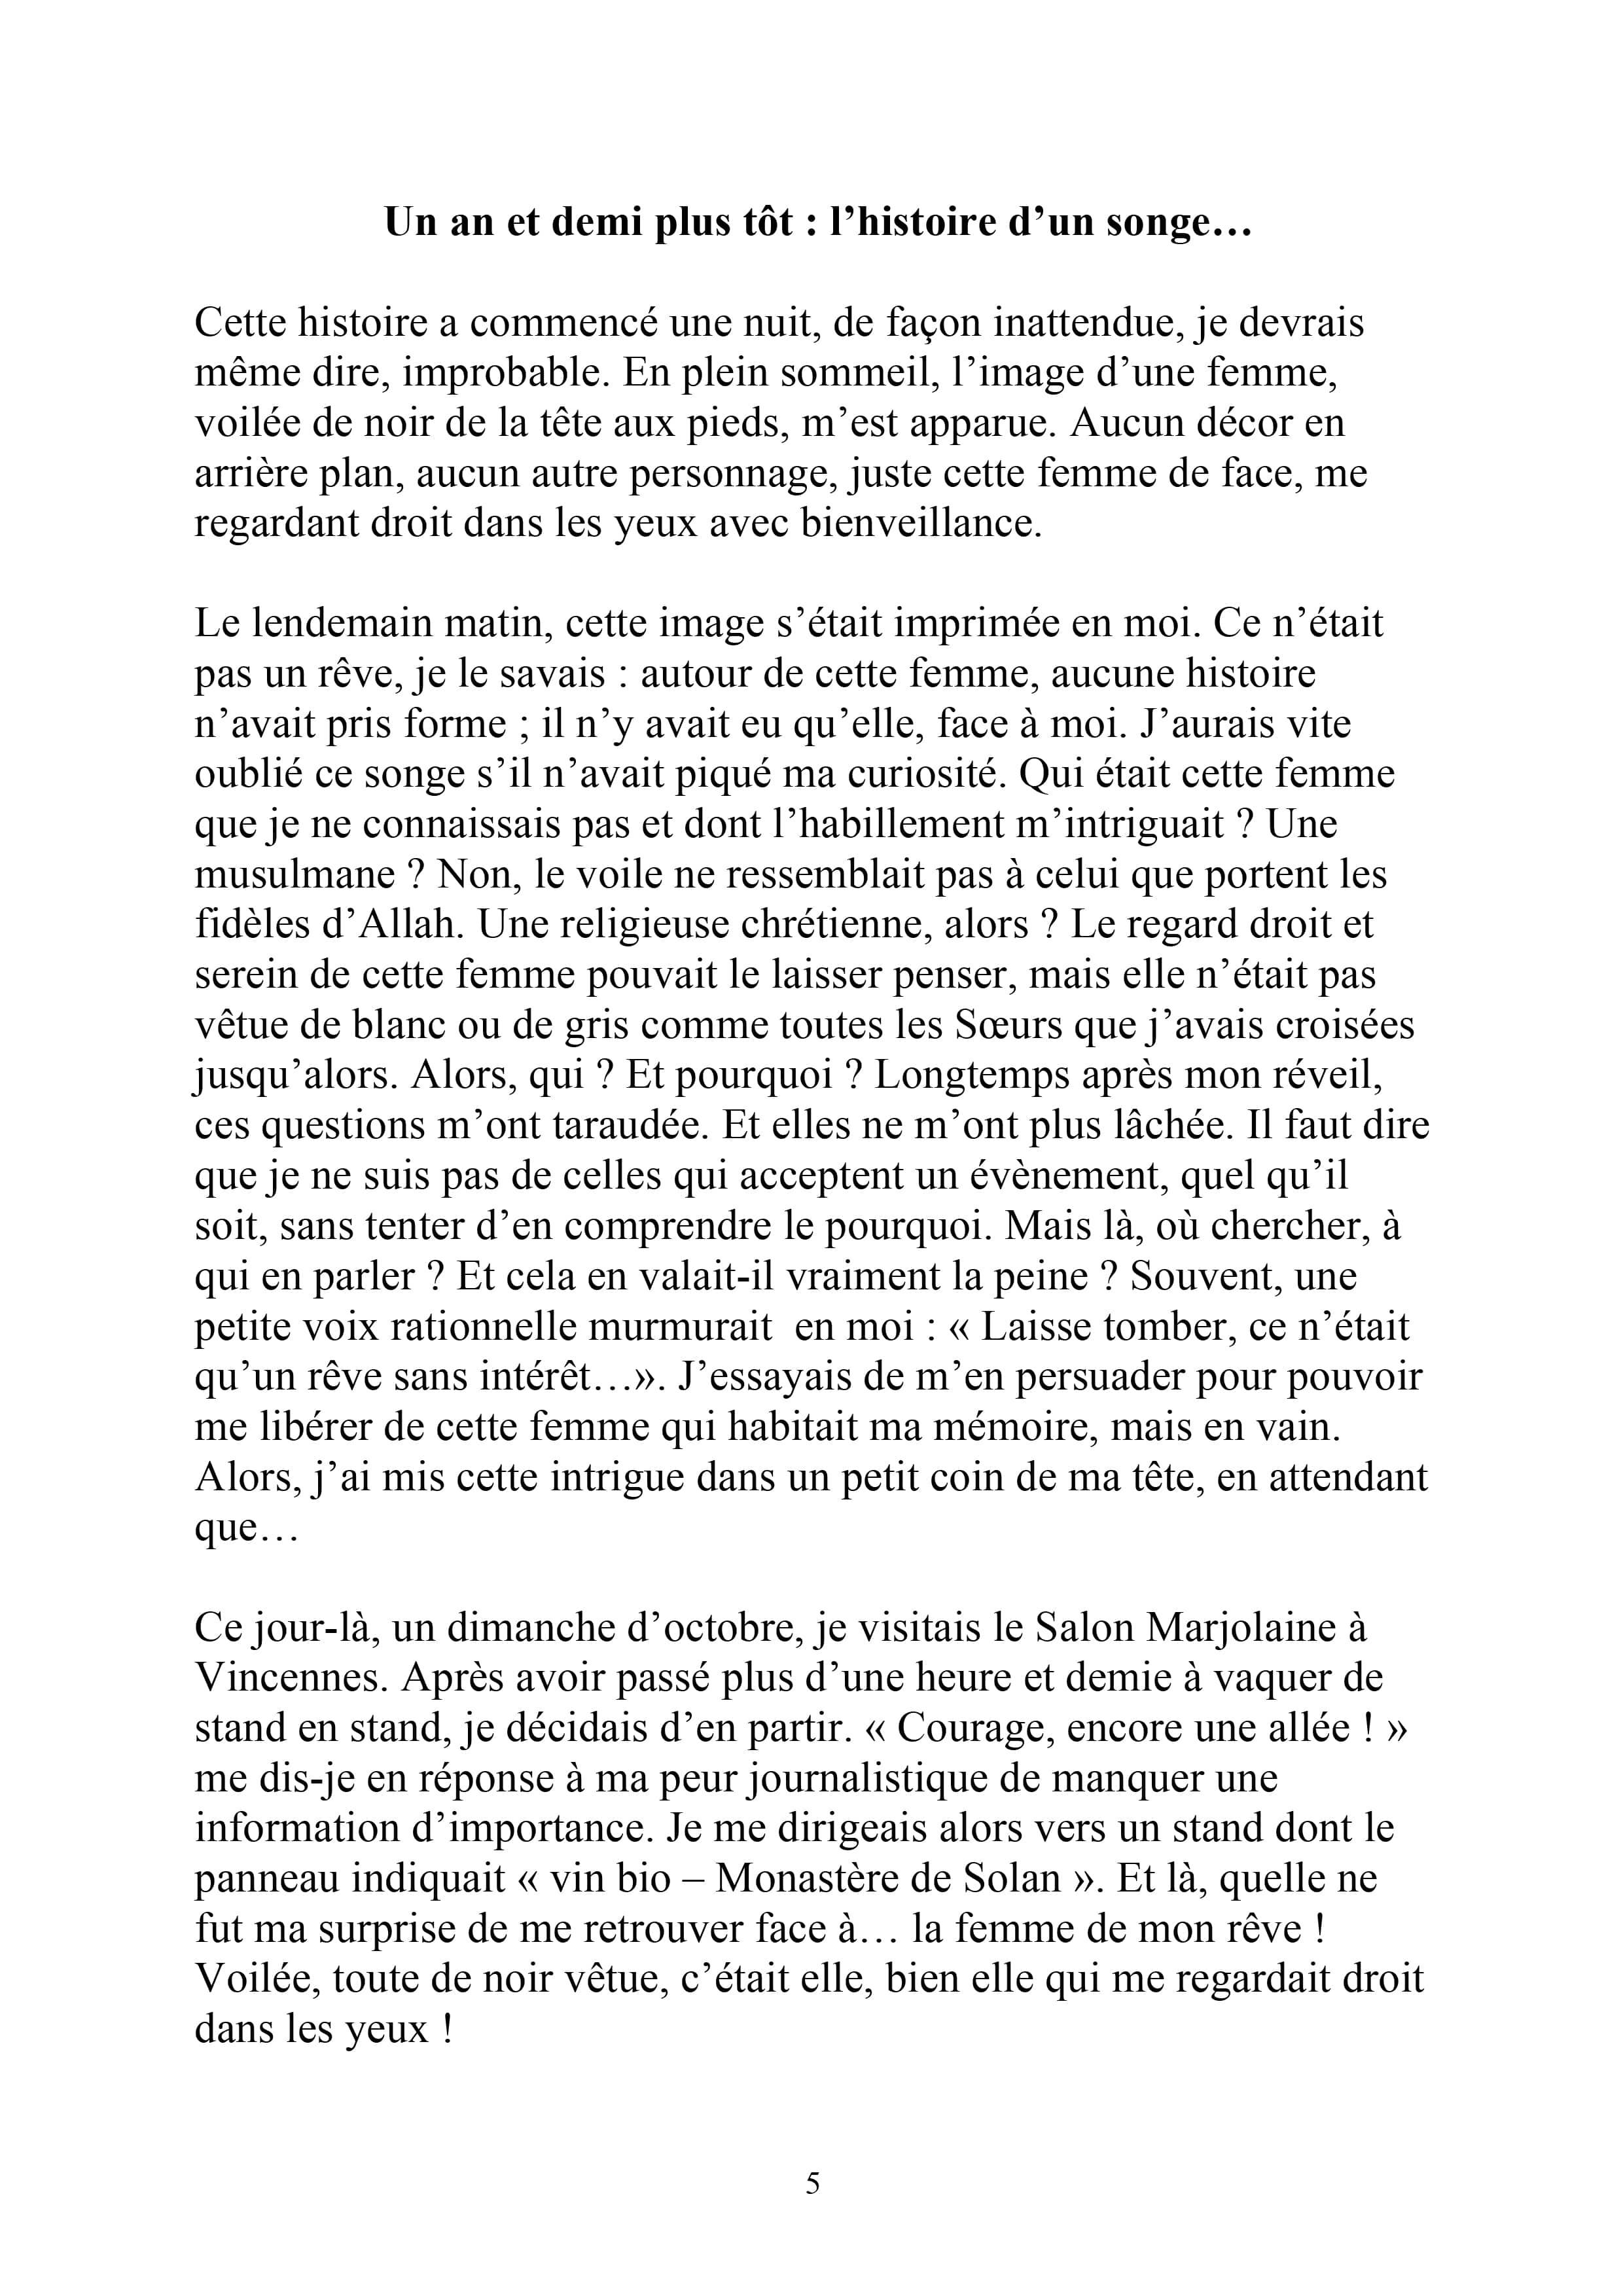 Ebook-Journal de retraite du monastère de solan-5.jpg